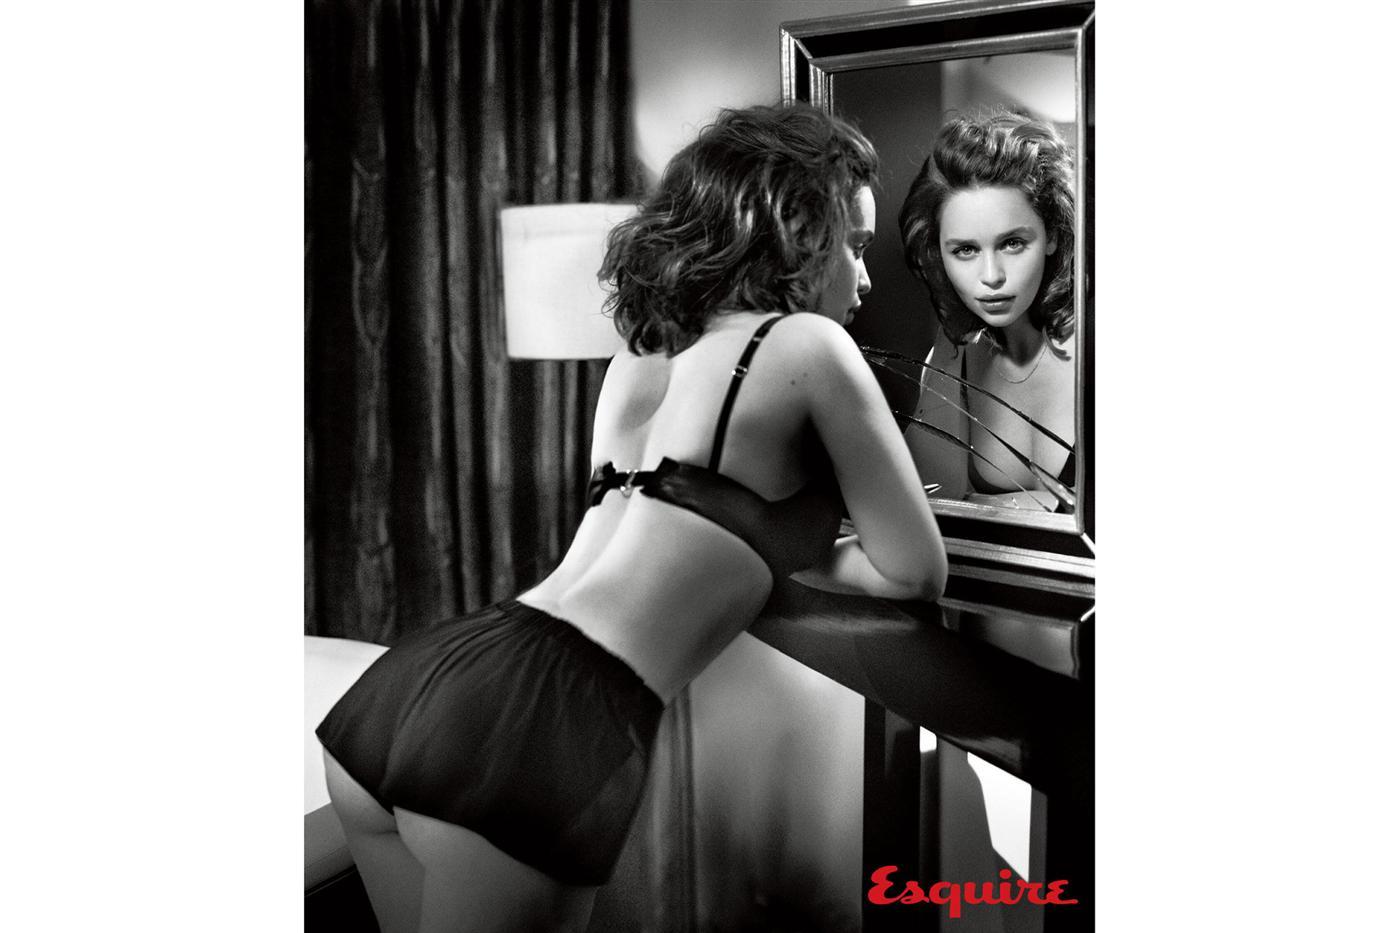 The Sexiest Woman Alive: Emilia Clarke 3